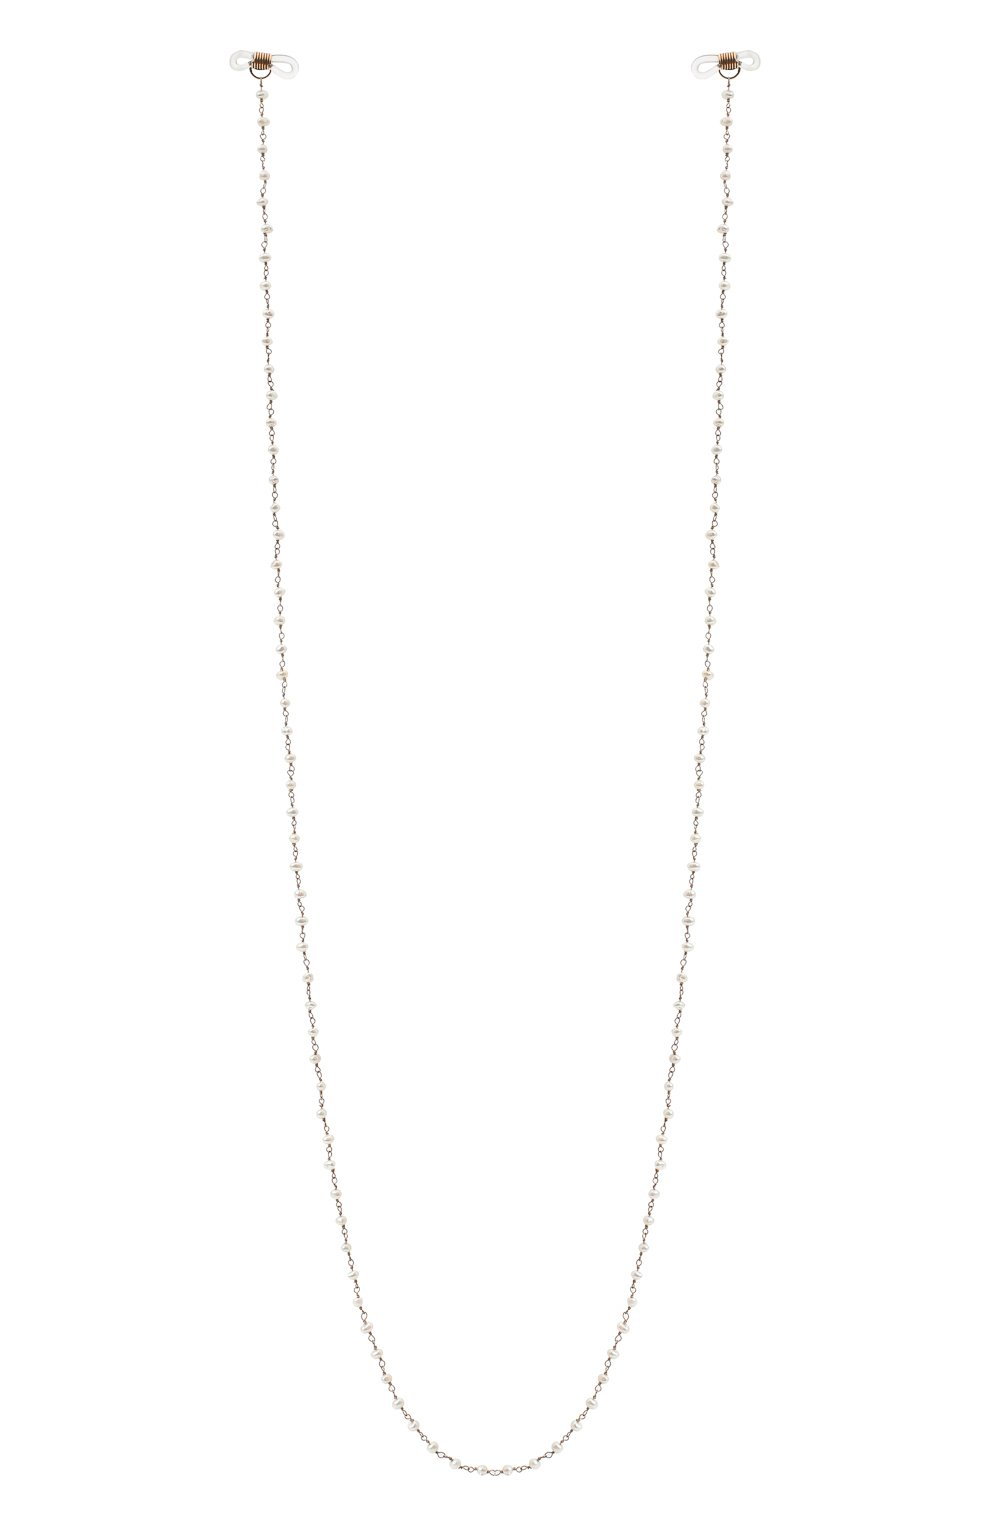 Женское колье DZHANELLI серебряного цвета, арт. 1045   Фото 1 (Материал: Серебро)